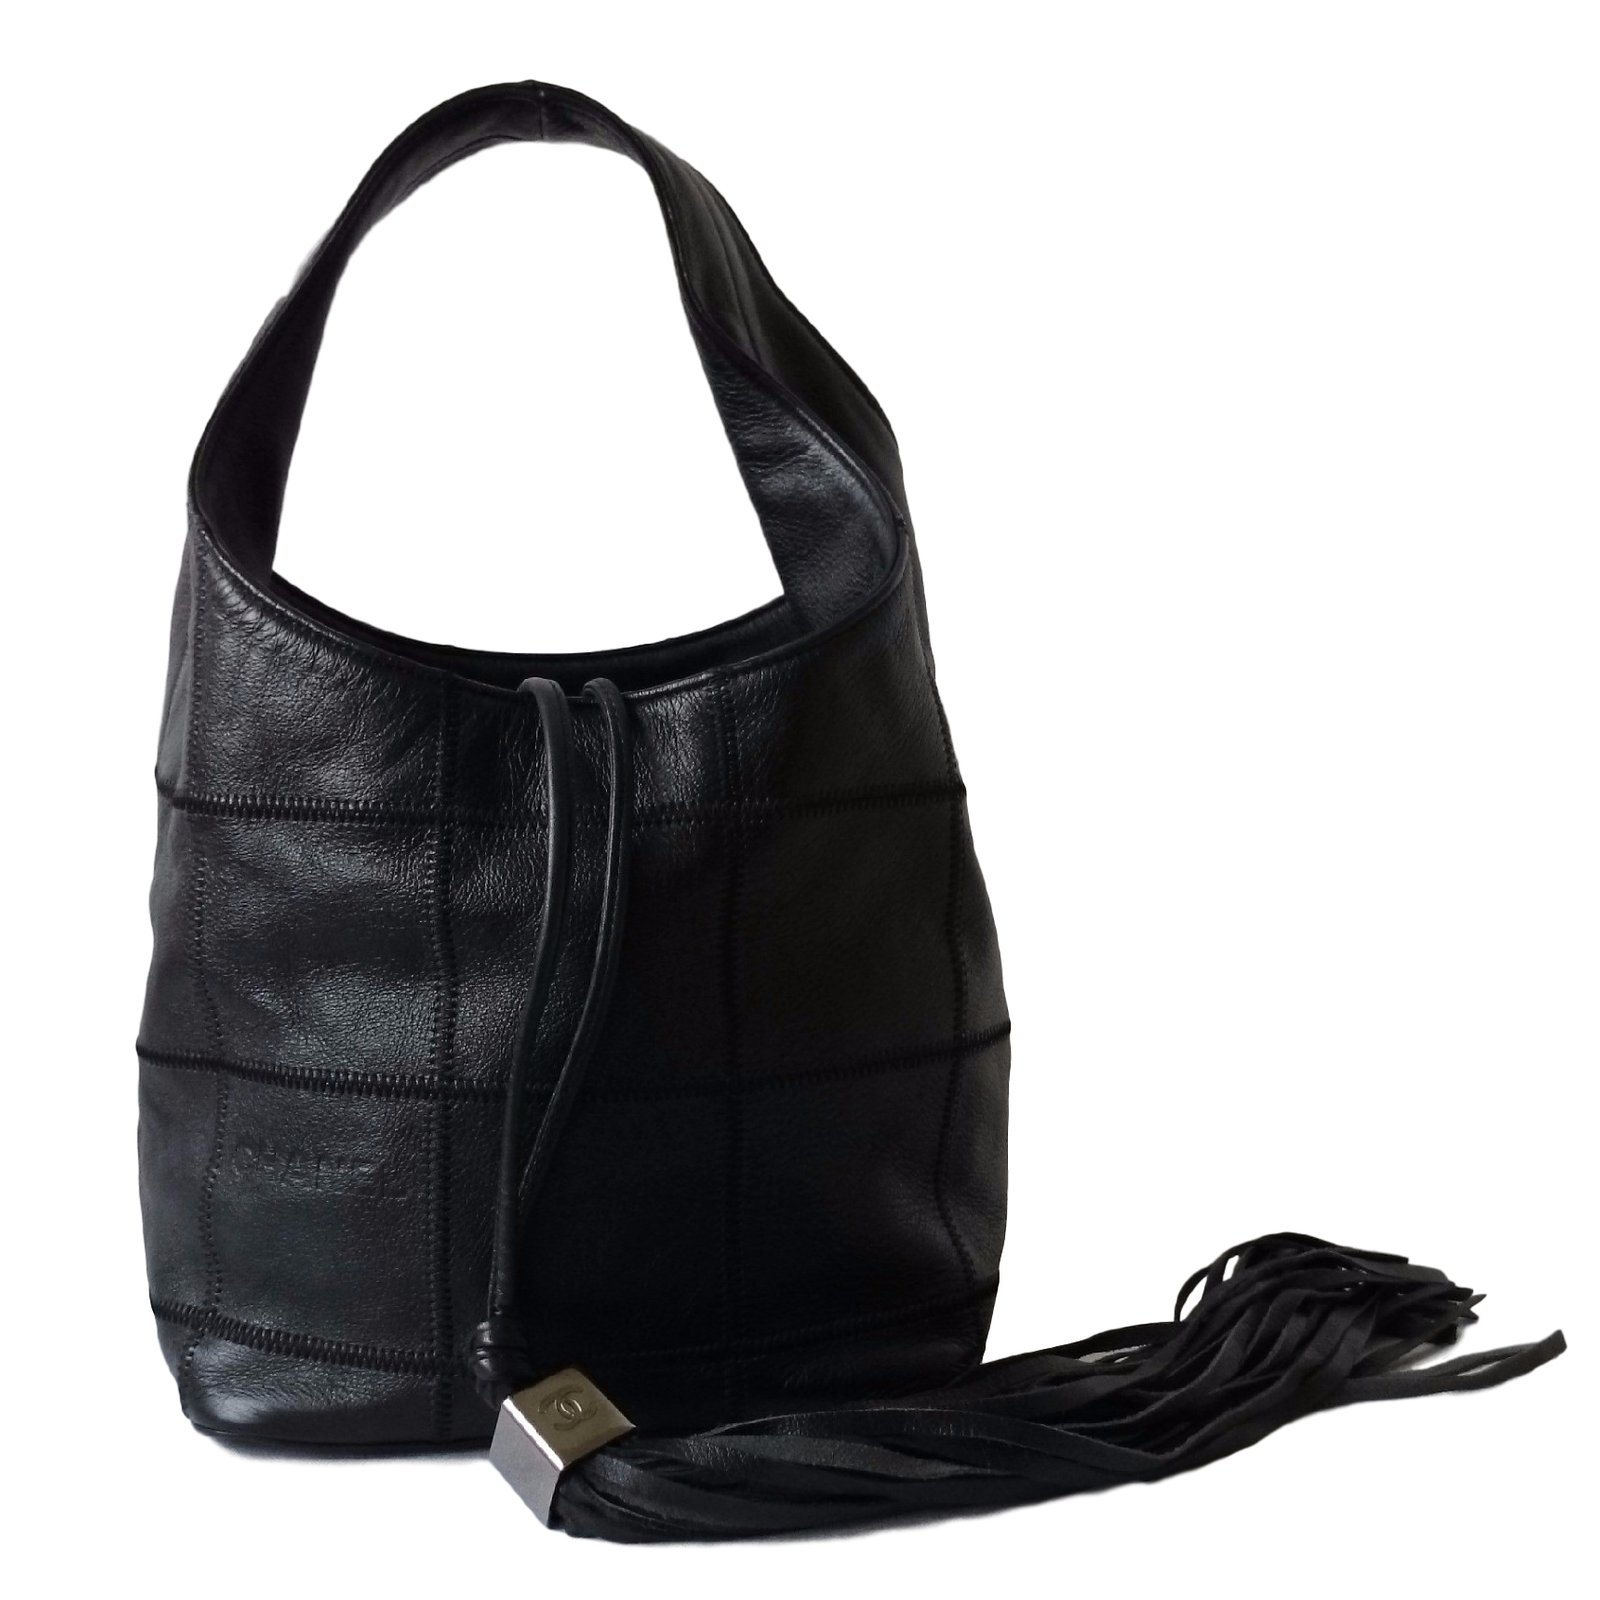 sacs main chanel sac seau cuir noir joli closet. Black Bedroom Furniture Sets. Home Design Ideas